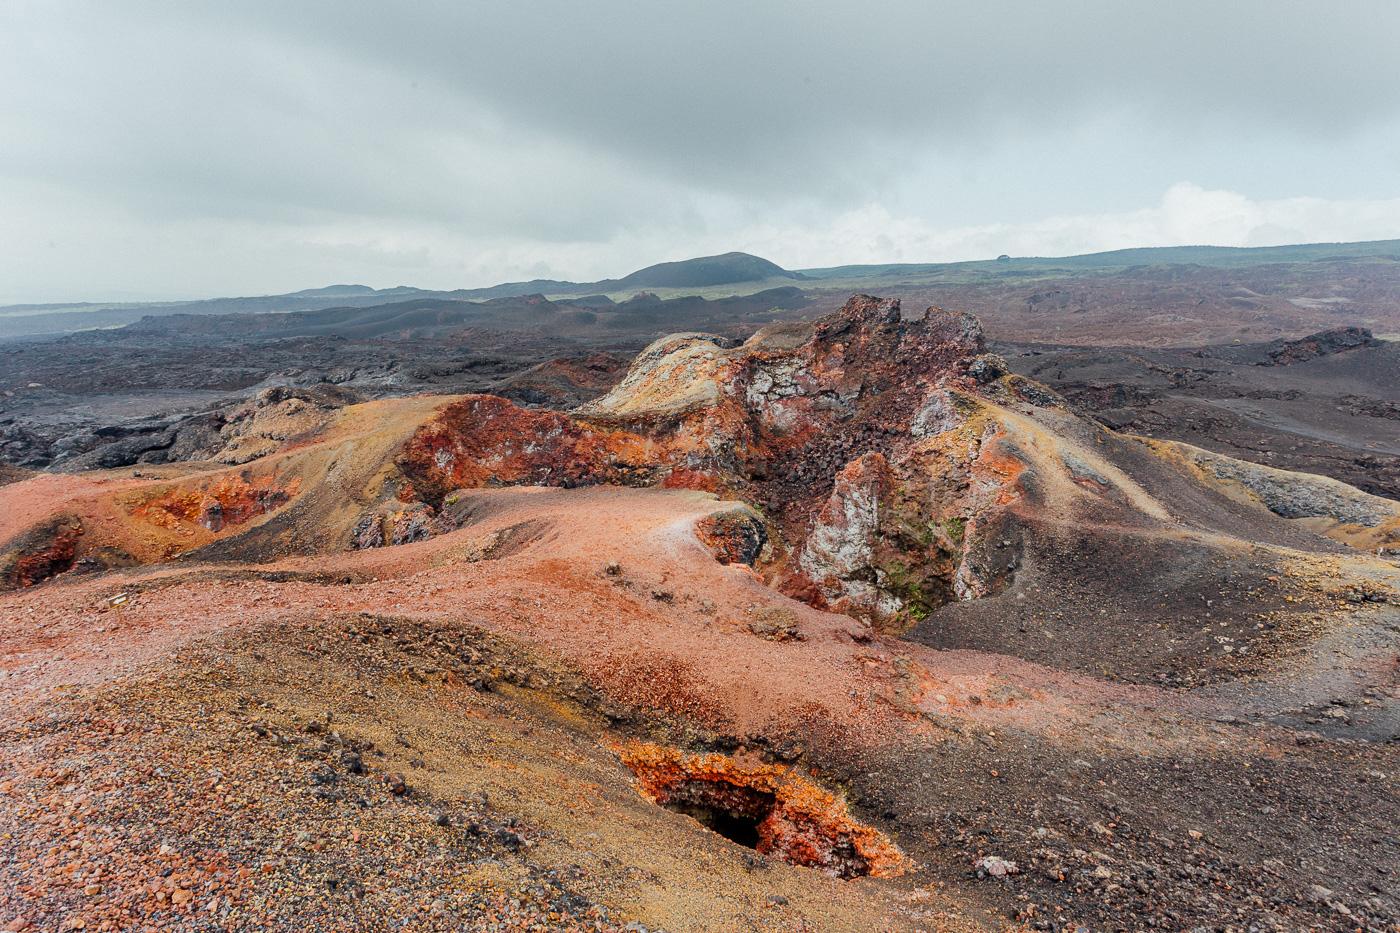 Galapagos - Sierra Negra Volcano (65 of 72) June 15